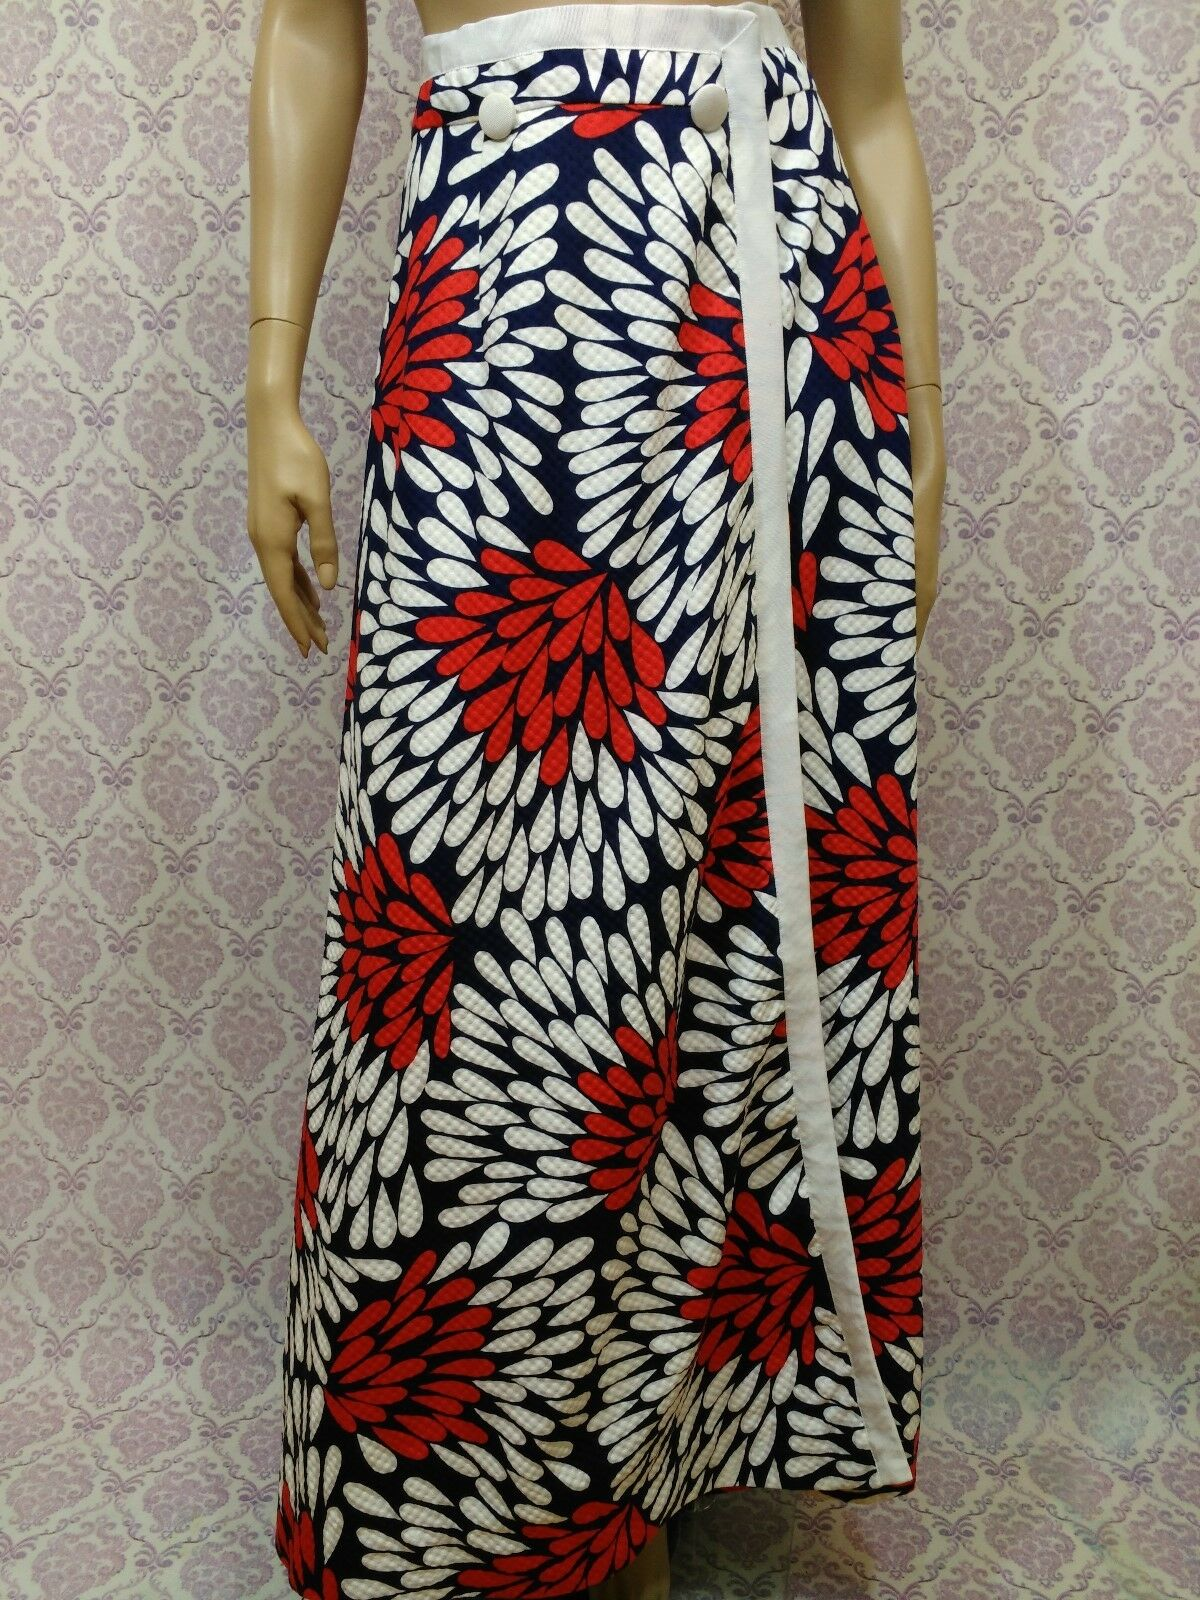 Vintage 60s Mod Maxi Skirt Womens S XS Wrap Style White bluee Red Print 25 Waist